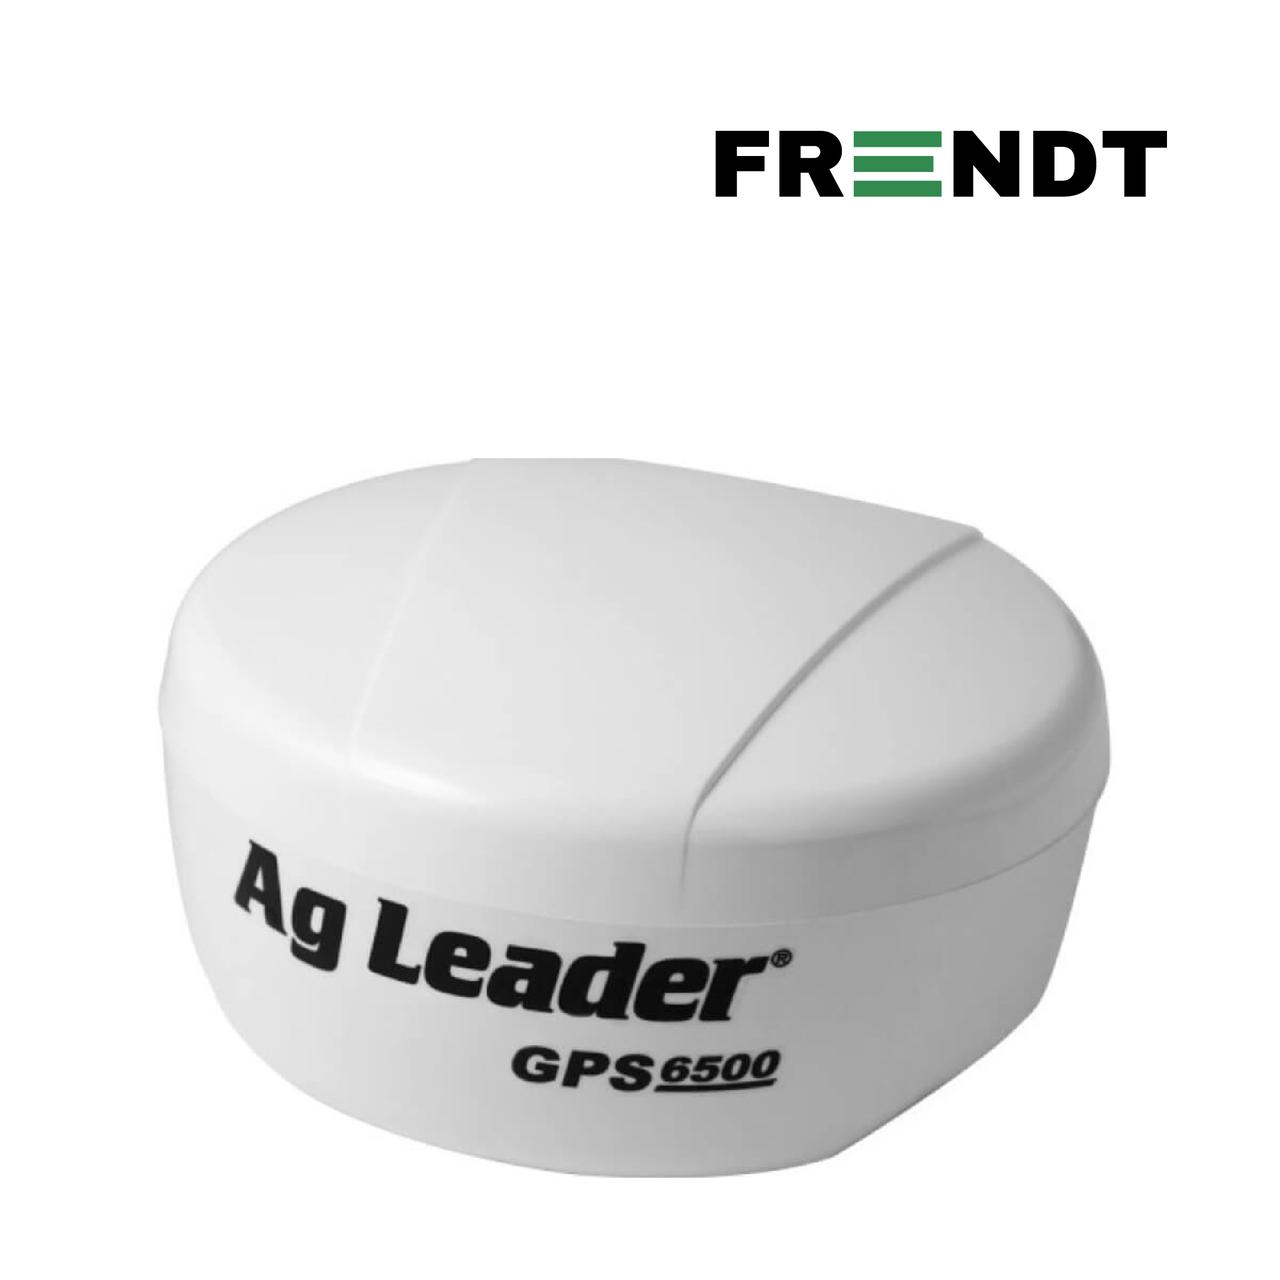 Приймач і антена Ag Leader GPS 6500 (L1, L2)